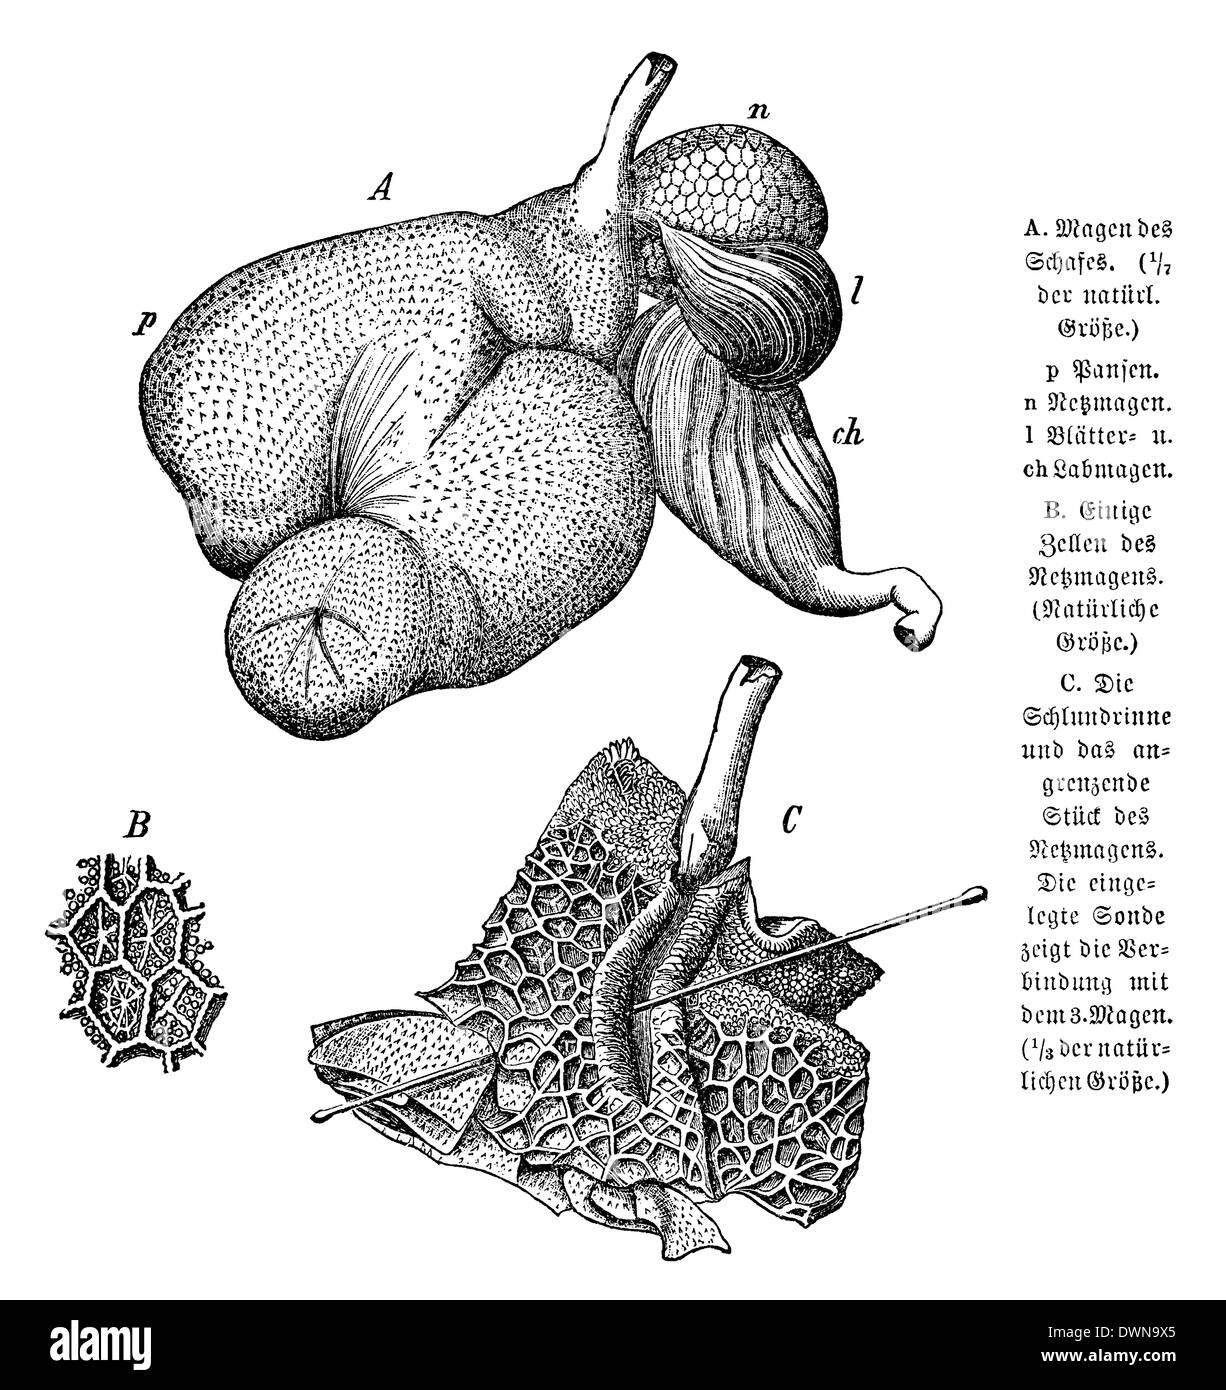 Großzügig Schafe Magen Anatomie Fotos - Anatomie Ideen - finotti.info